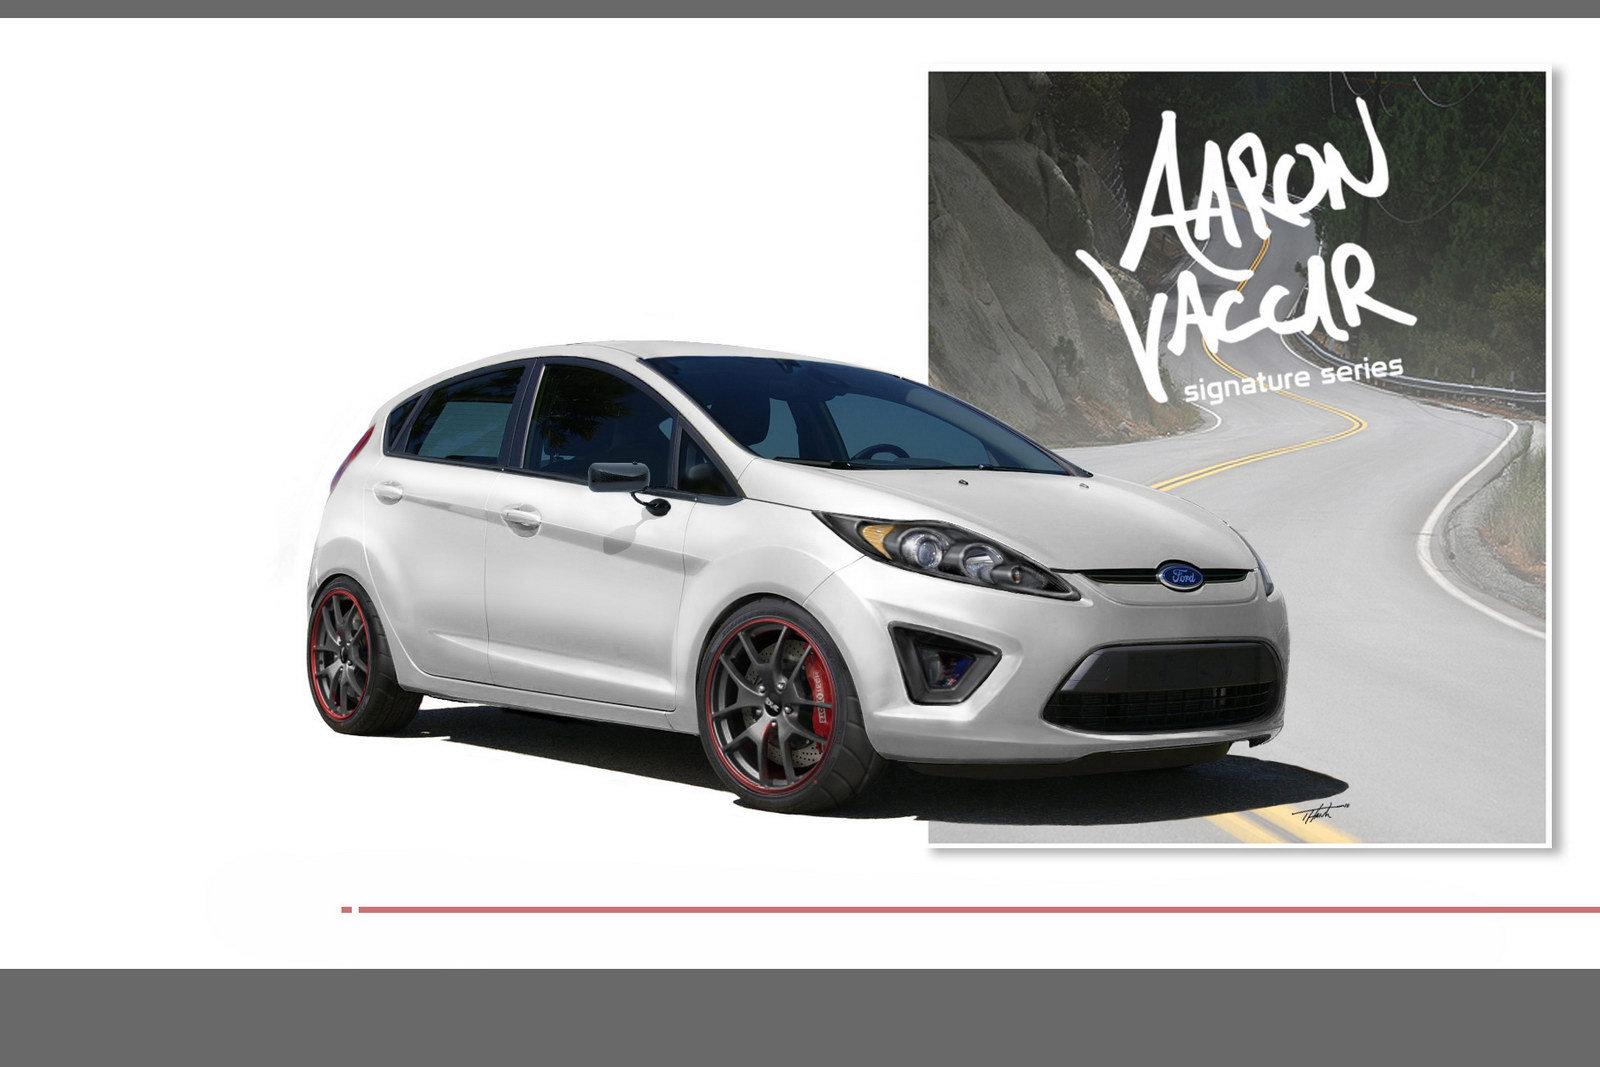 http://2.bp.blogspot.com/-aXCYqibqaSc/Tqb4BTDB7sI/AAAAAAAADF4/tEvYpoKAr-I/s1600/SEMA2011-Ford-Fiesta.jpg